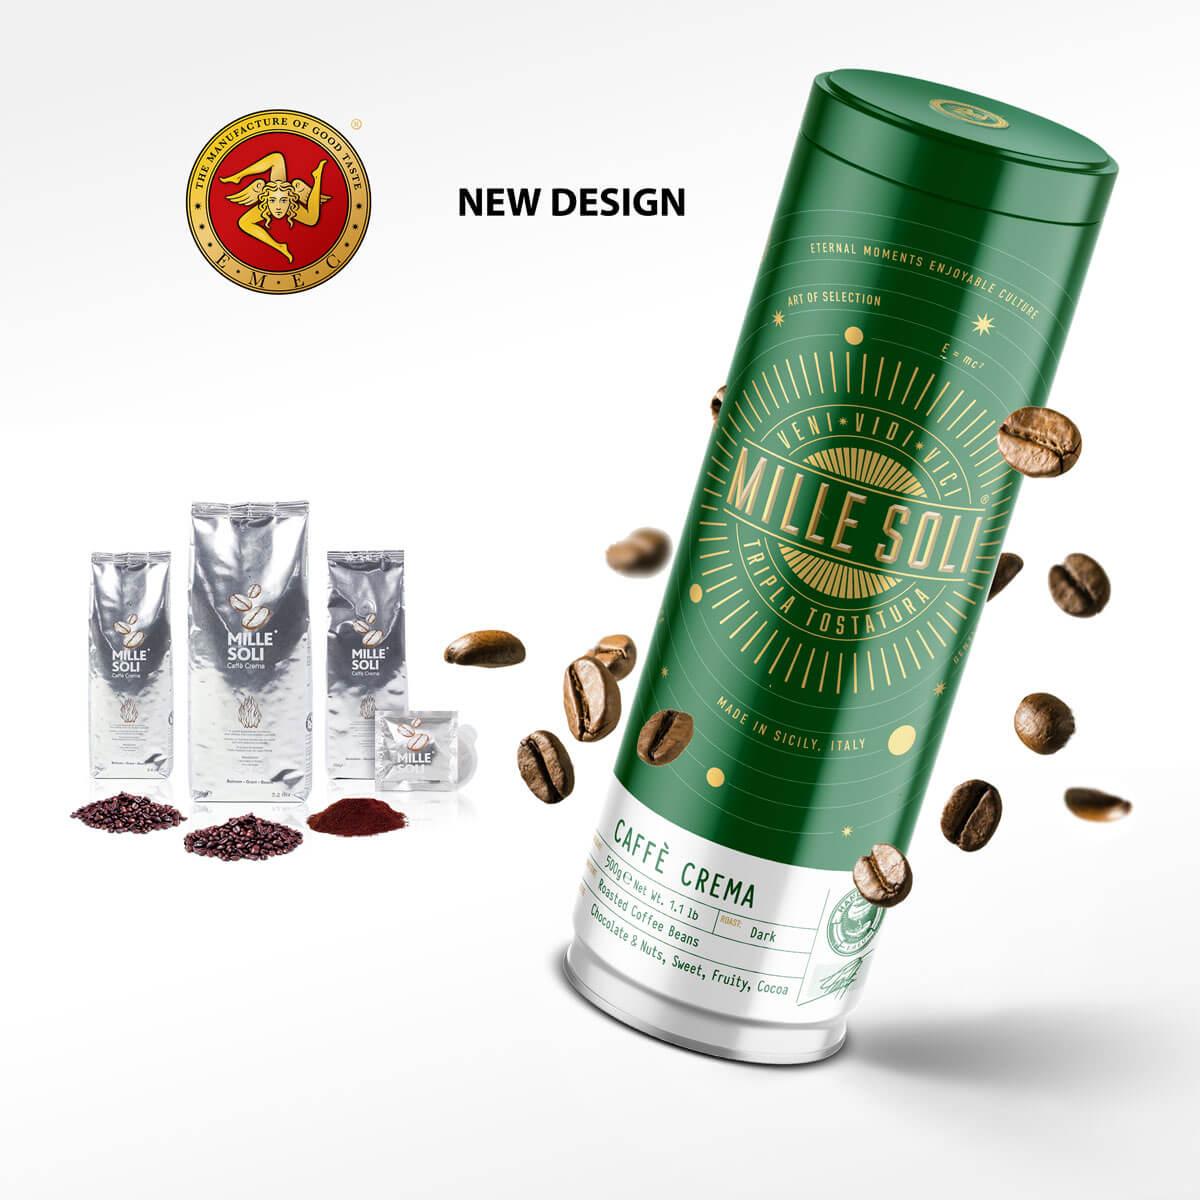 MILLE SOLI Caffè Crema Rebranding altes und neues Design